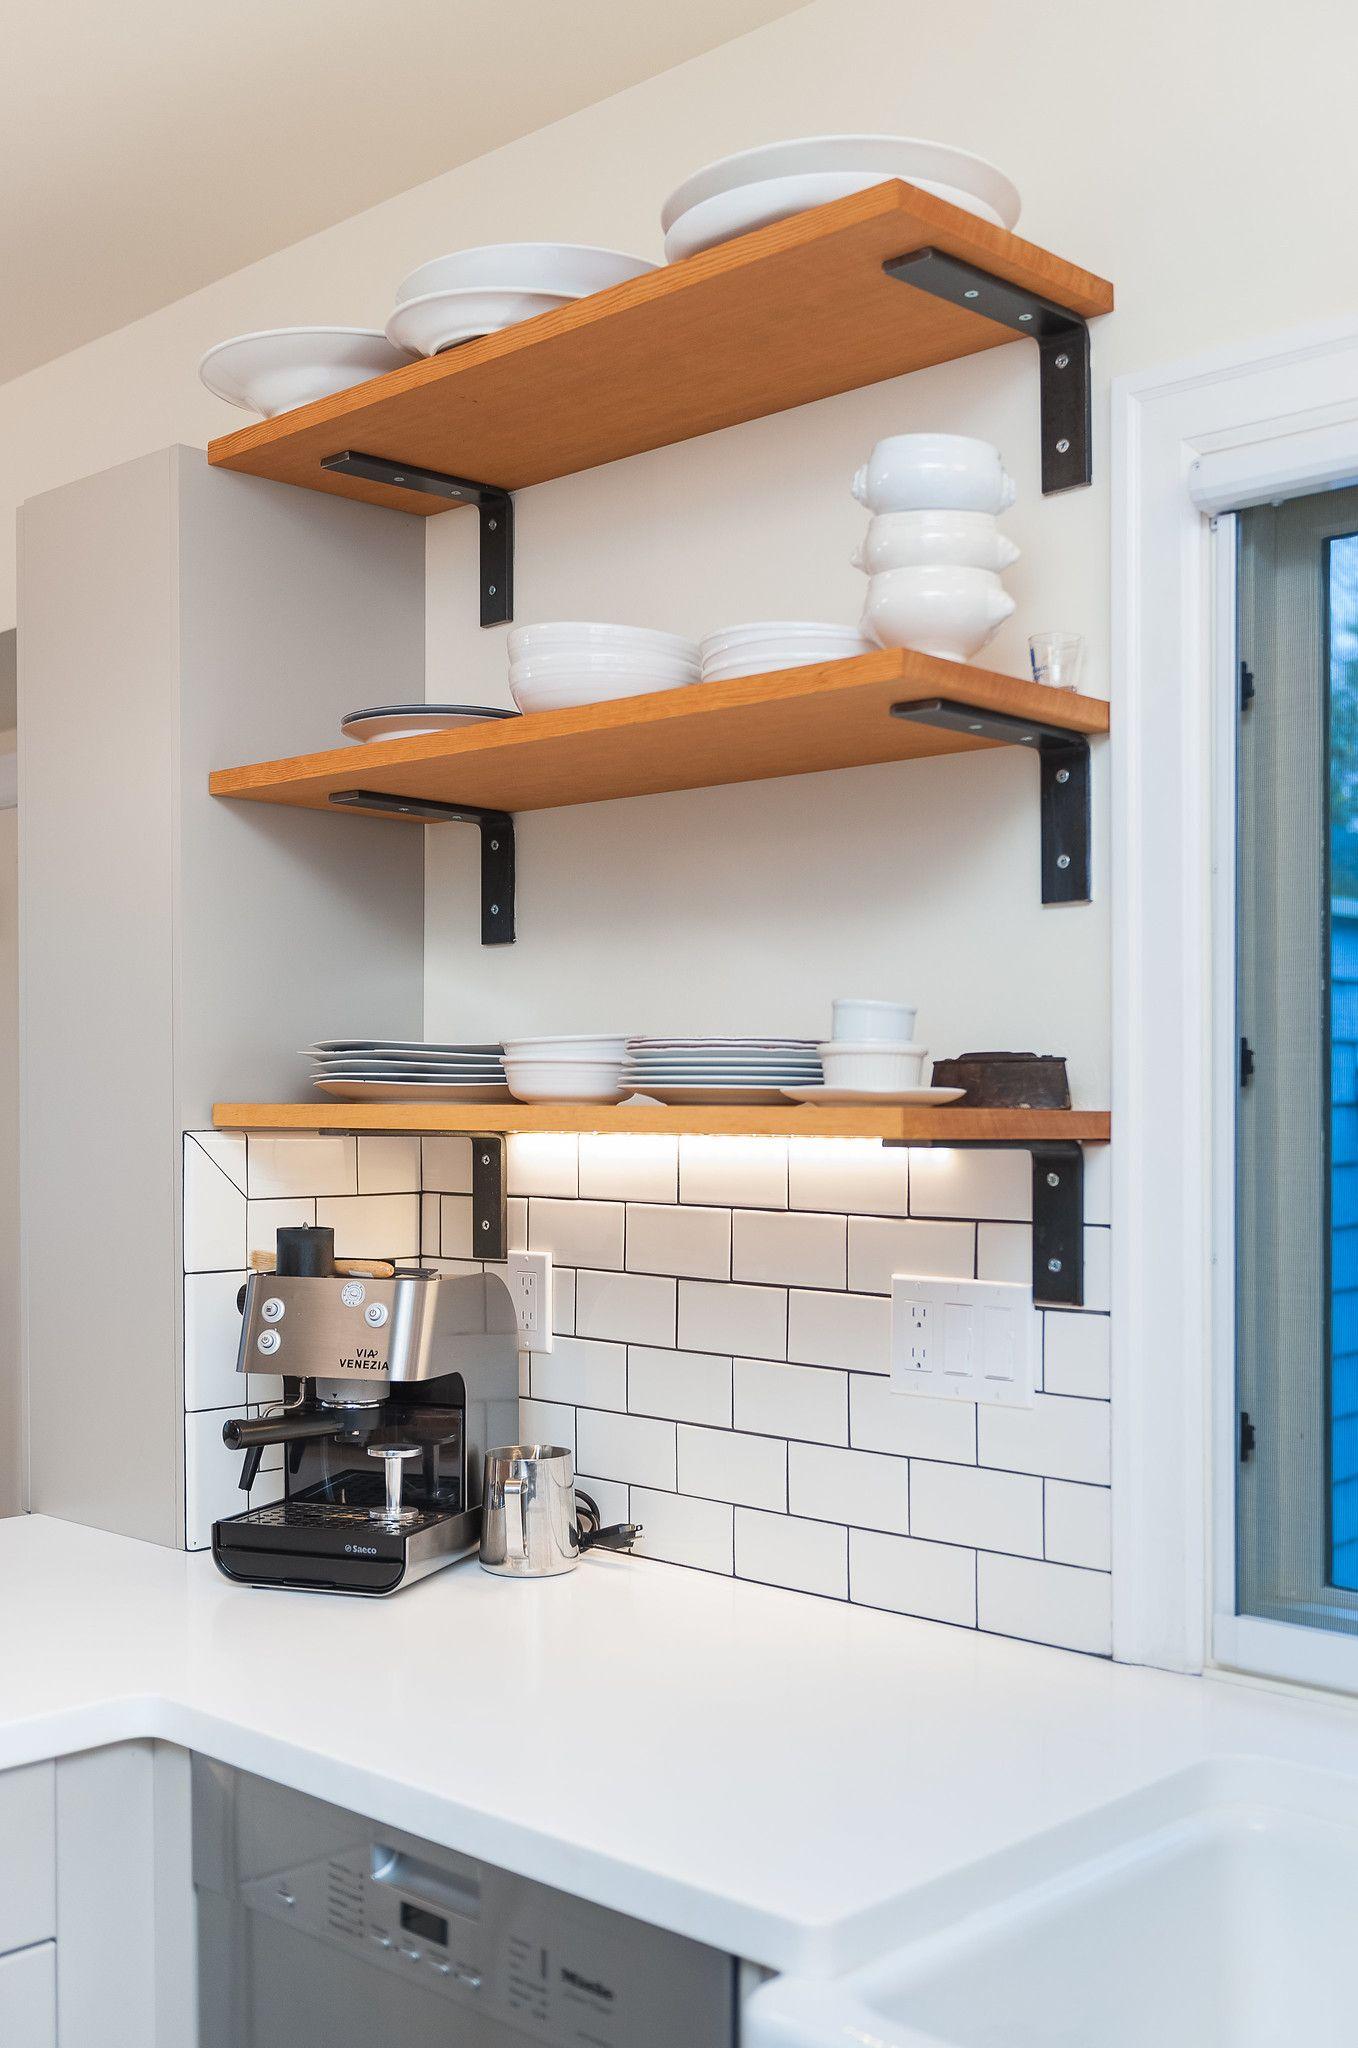 Kitchen Open Shelving Kitchen Remodel Design Kitchen Remodel White Subway Tile Backsplash